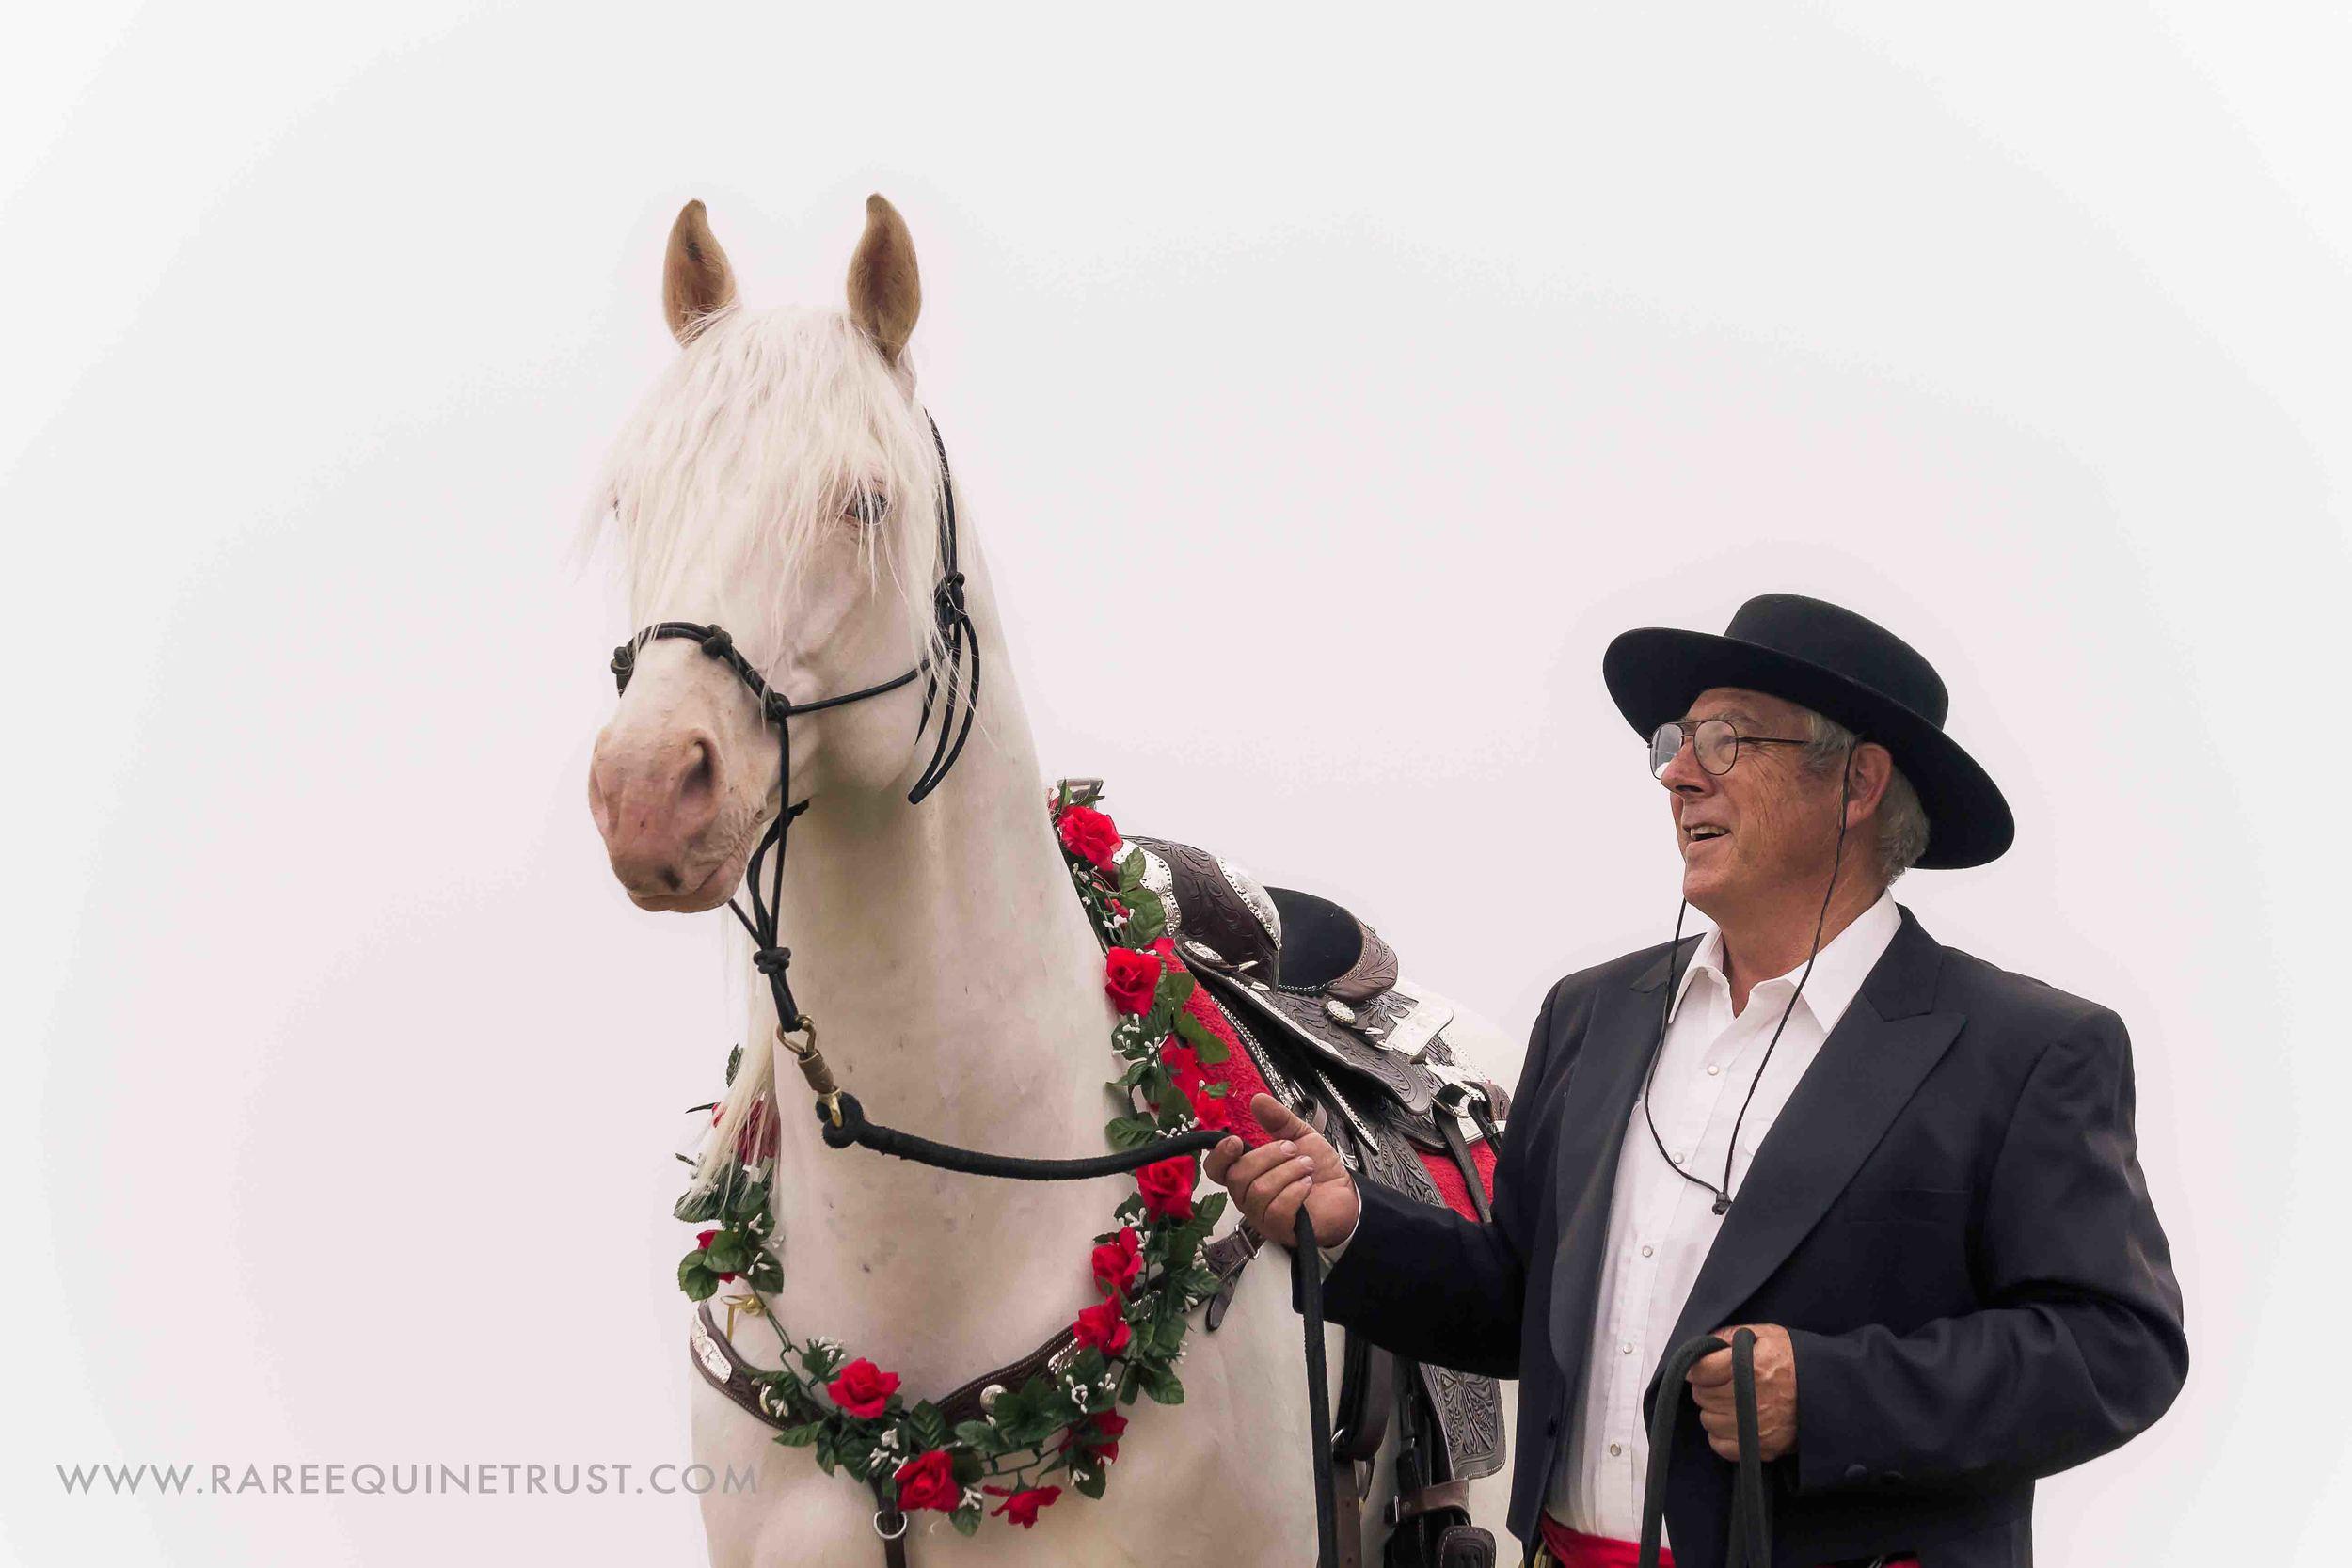 Adolfo Camarillo Great-grandson Harold Parker and his Camarillo White Horse stallion El Patron.